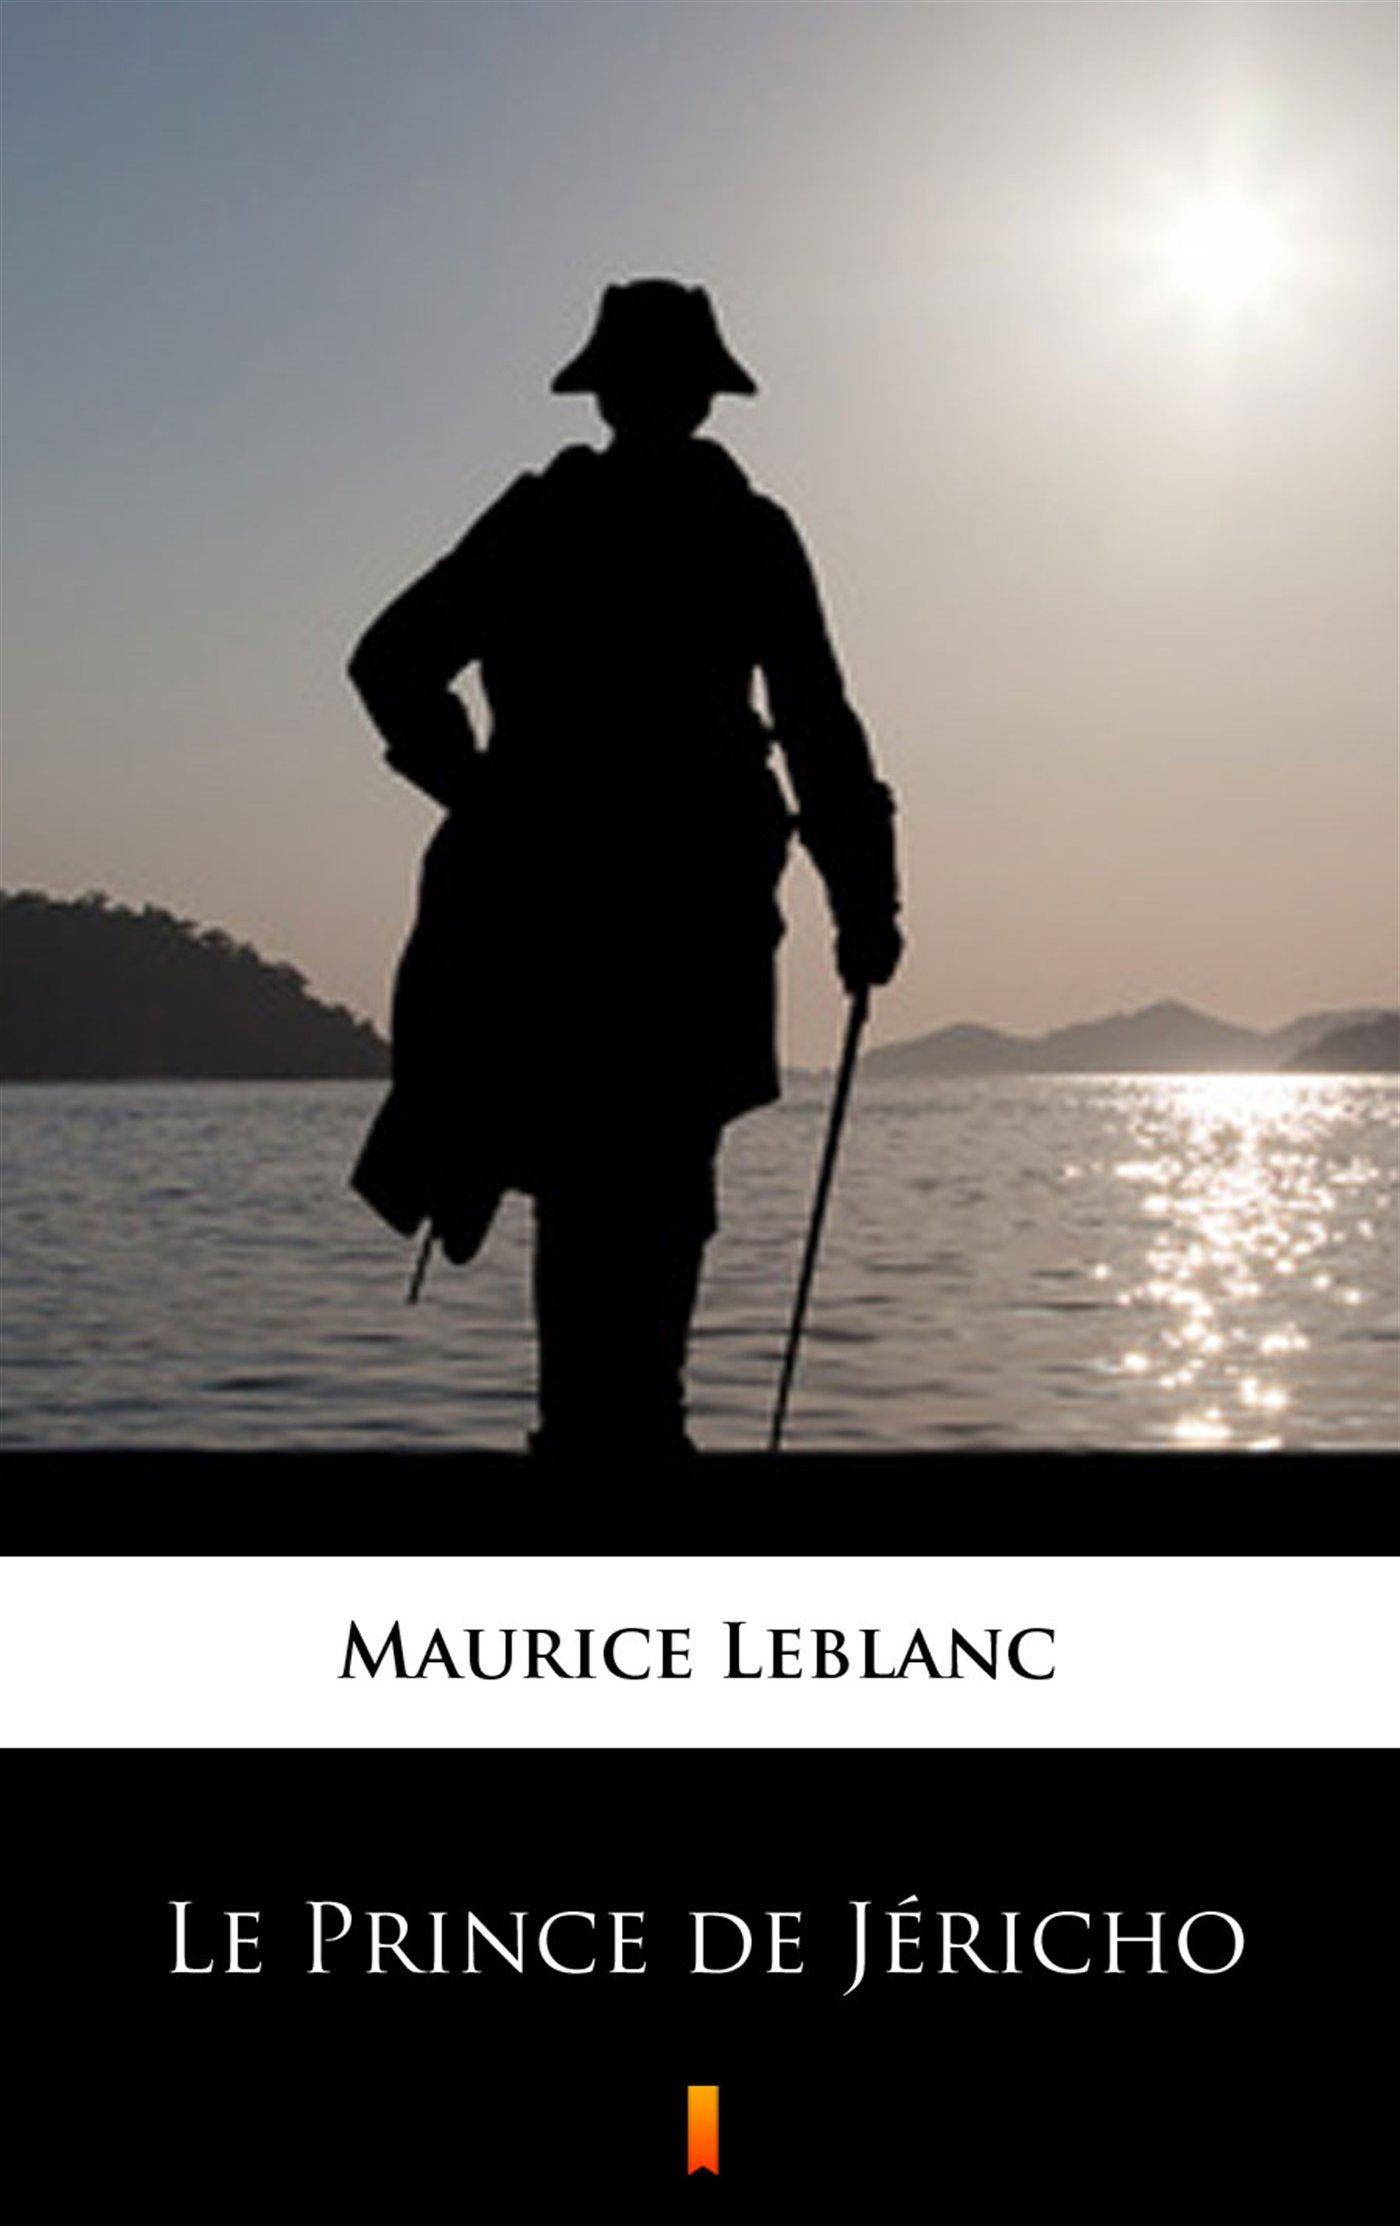 Le Prince de Jericho - Ebook (Książka EPUB) do pobrania w formacie EPUB